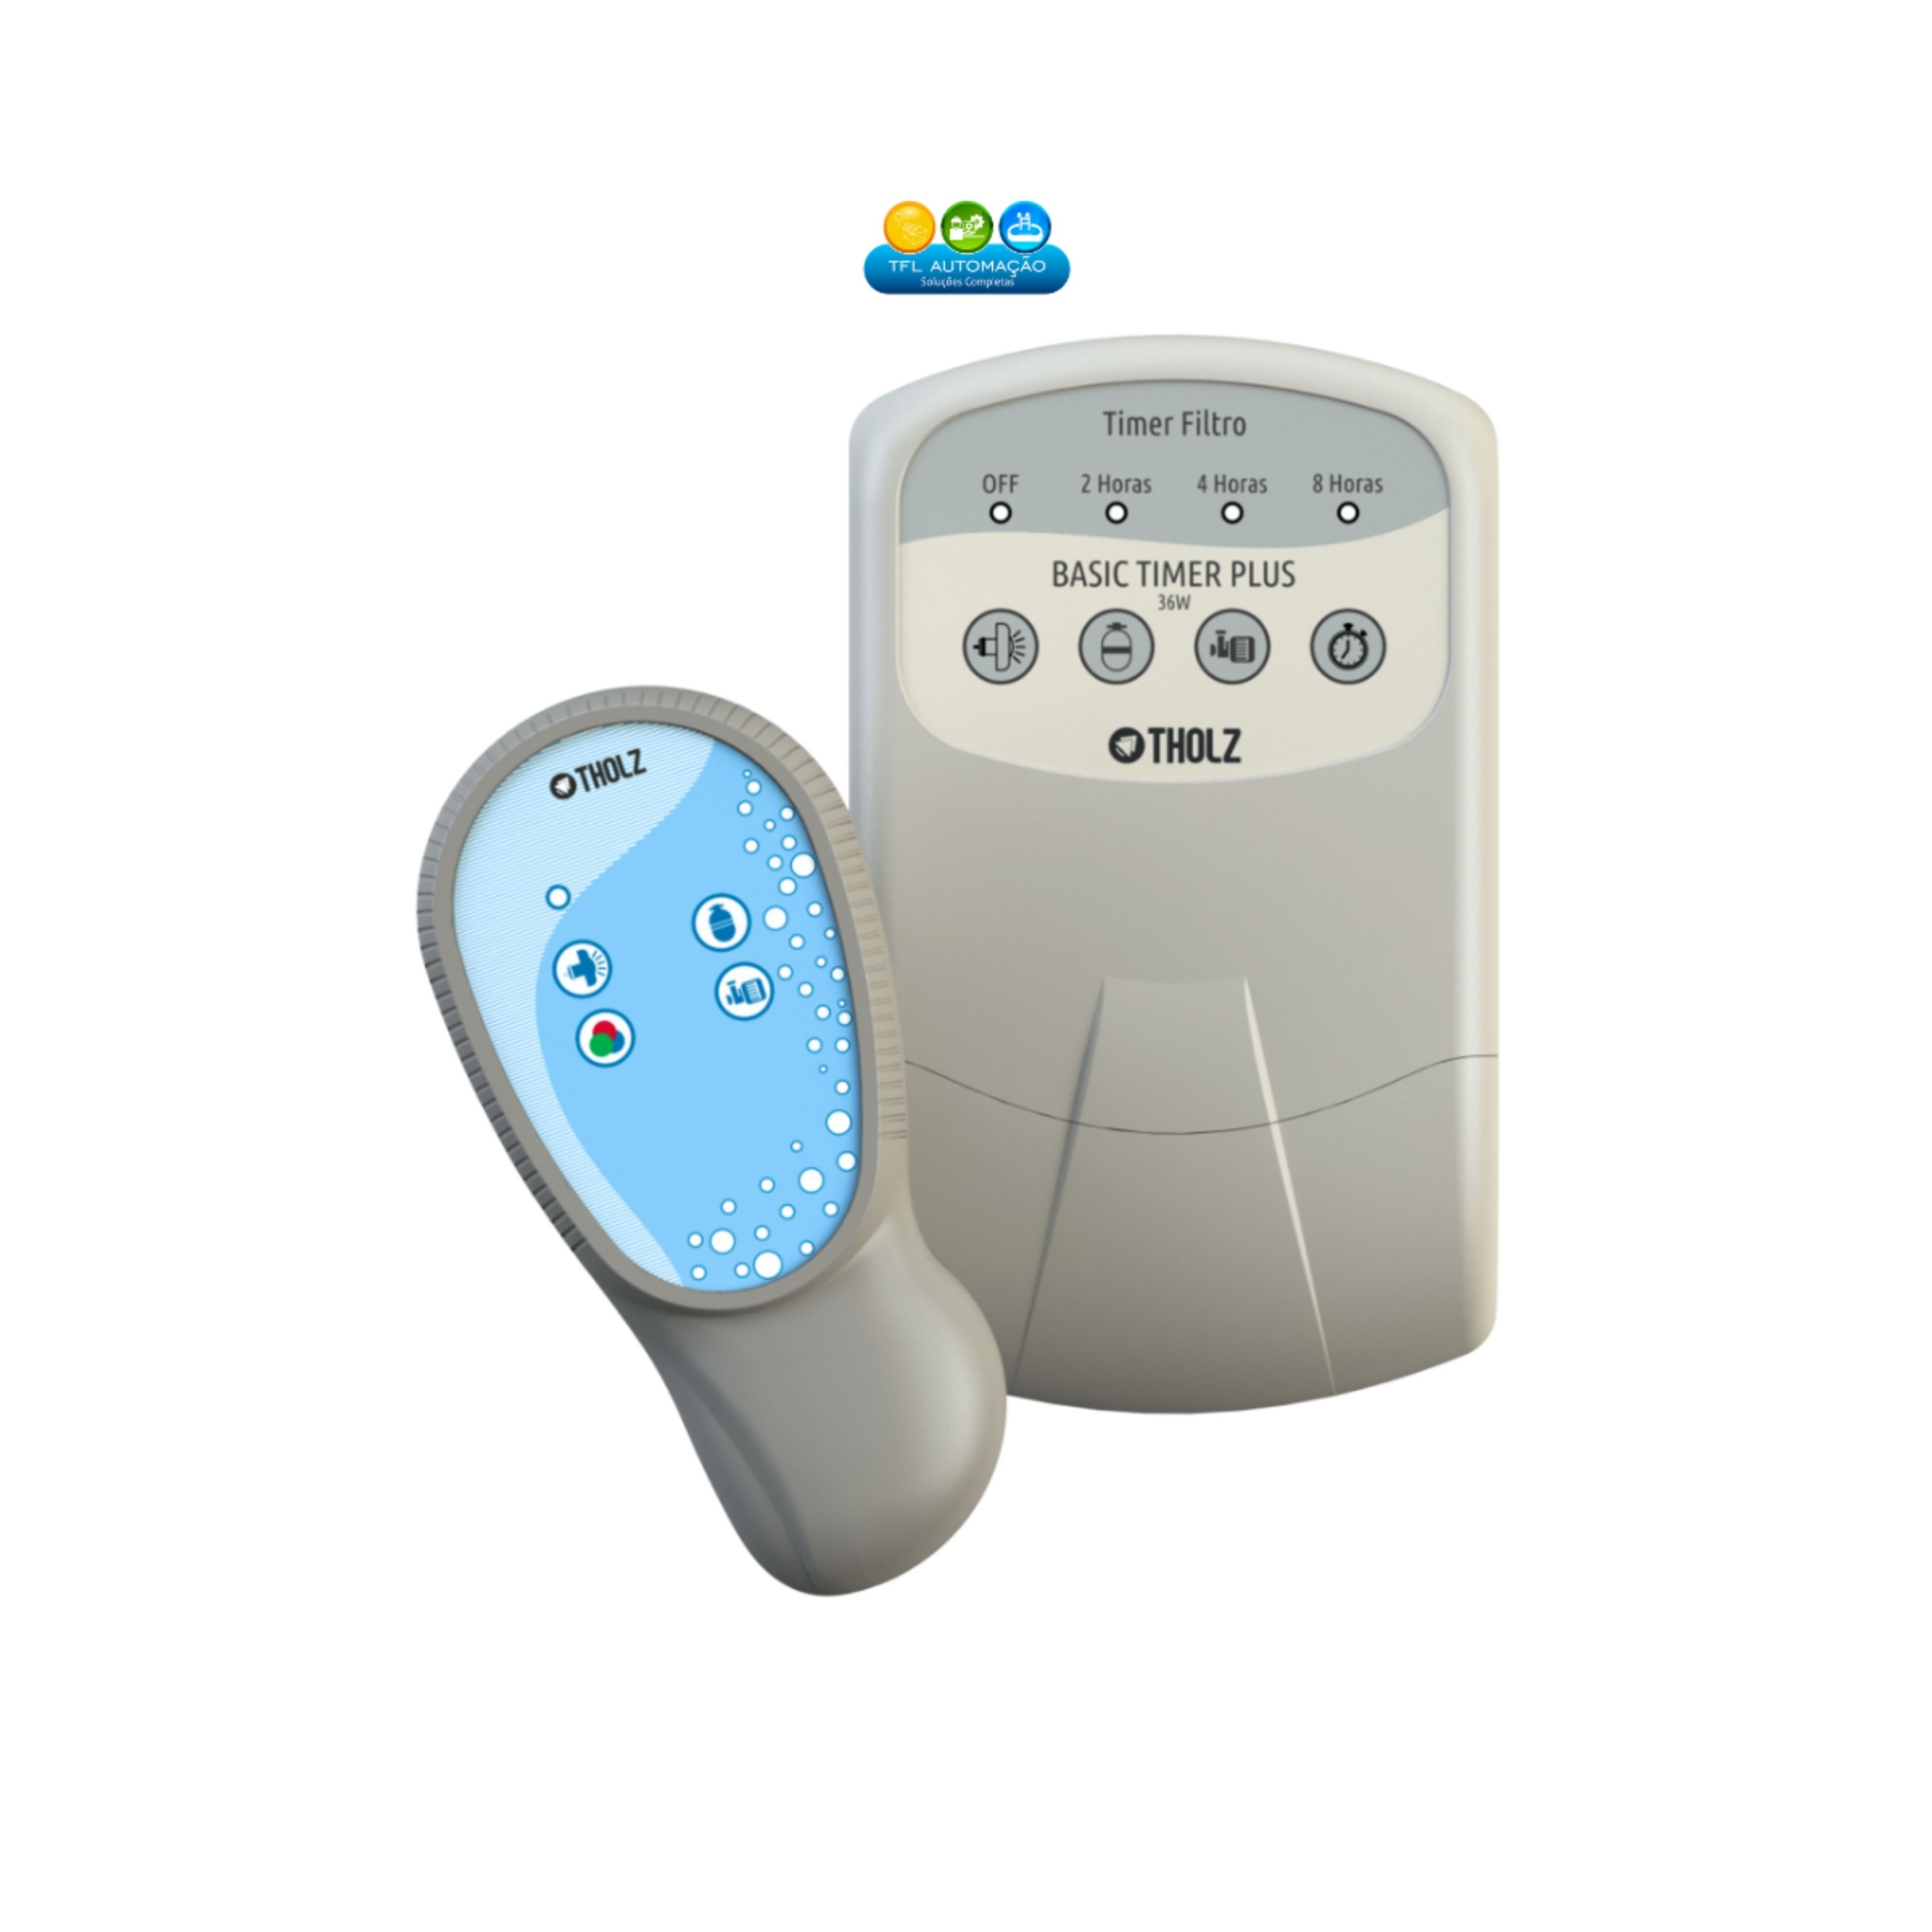 Basic Timer Plus 36w c/ Timer p/ Filtro - 90~240vca - Tholz